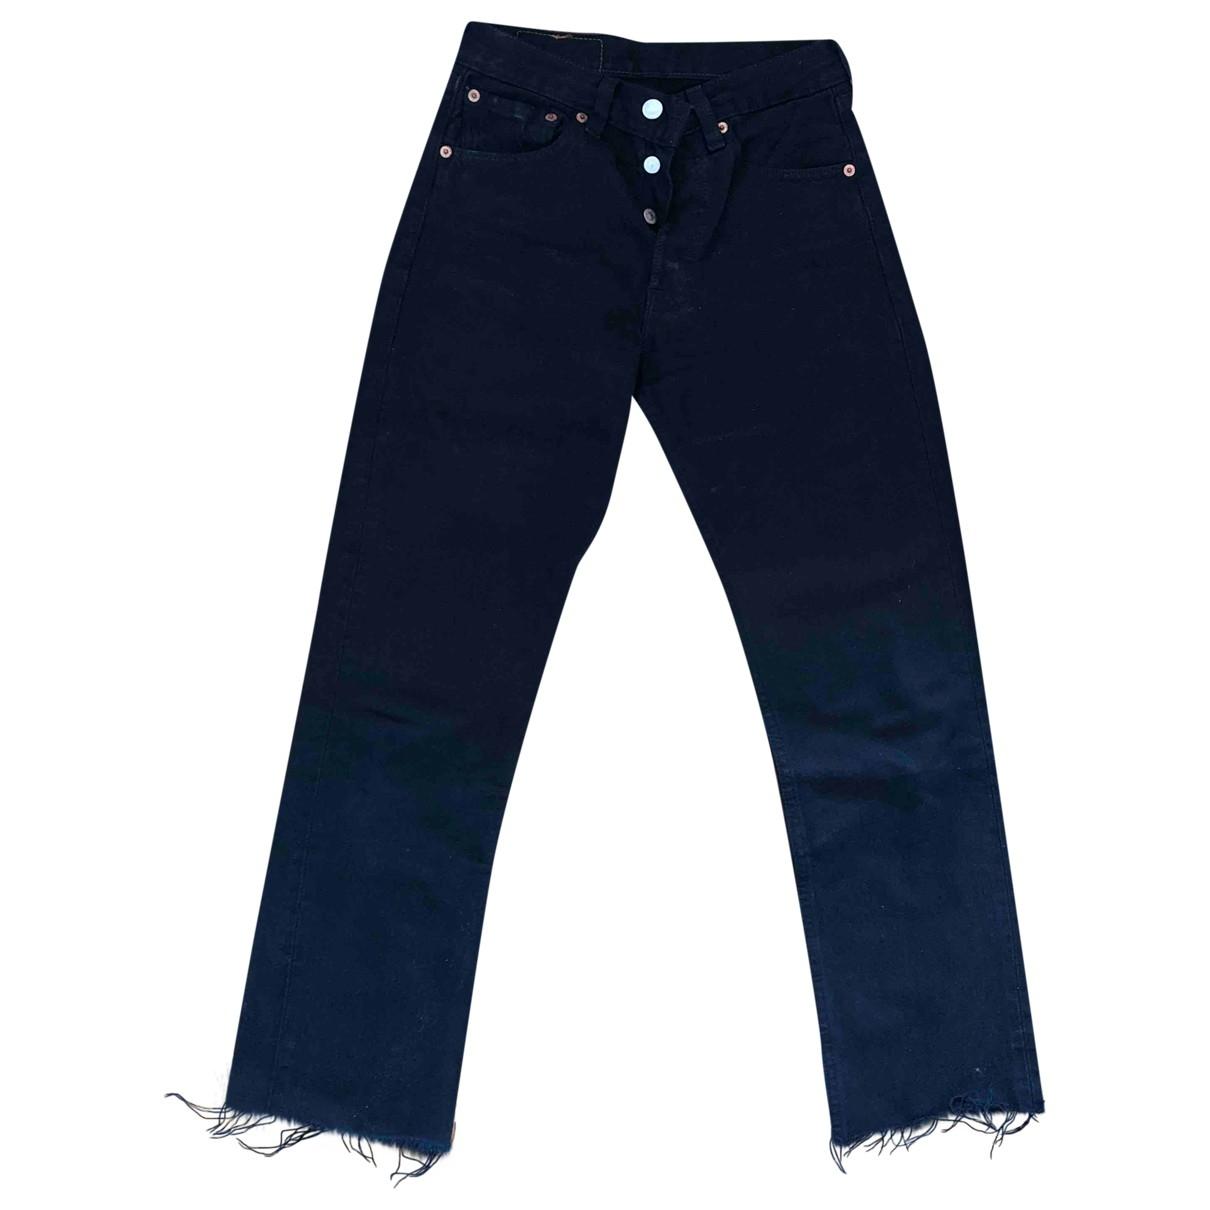 Levi's \N Black Denim - Jeans Trousers for Women XS International